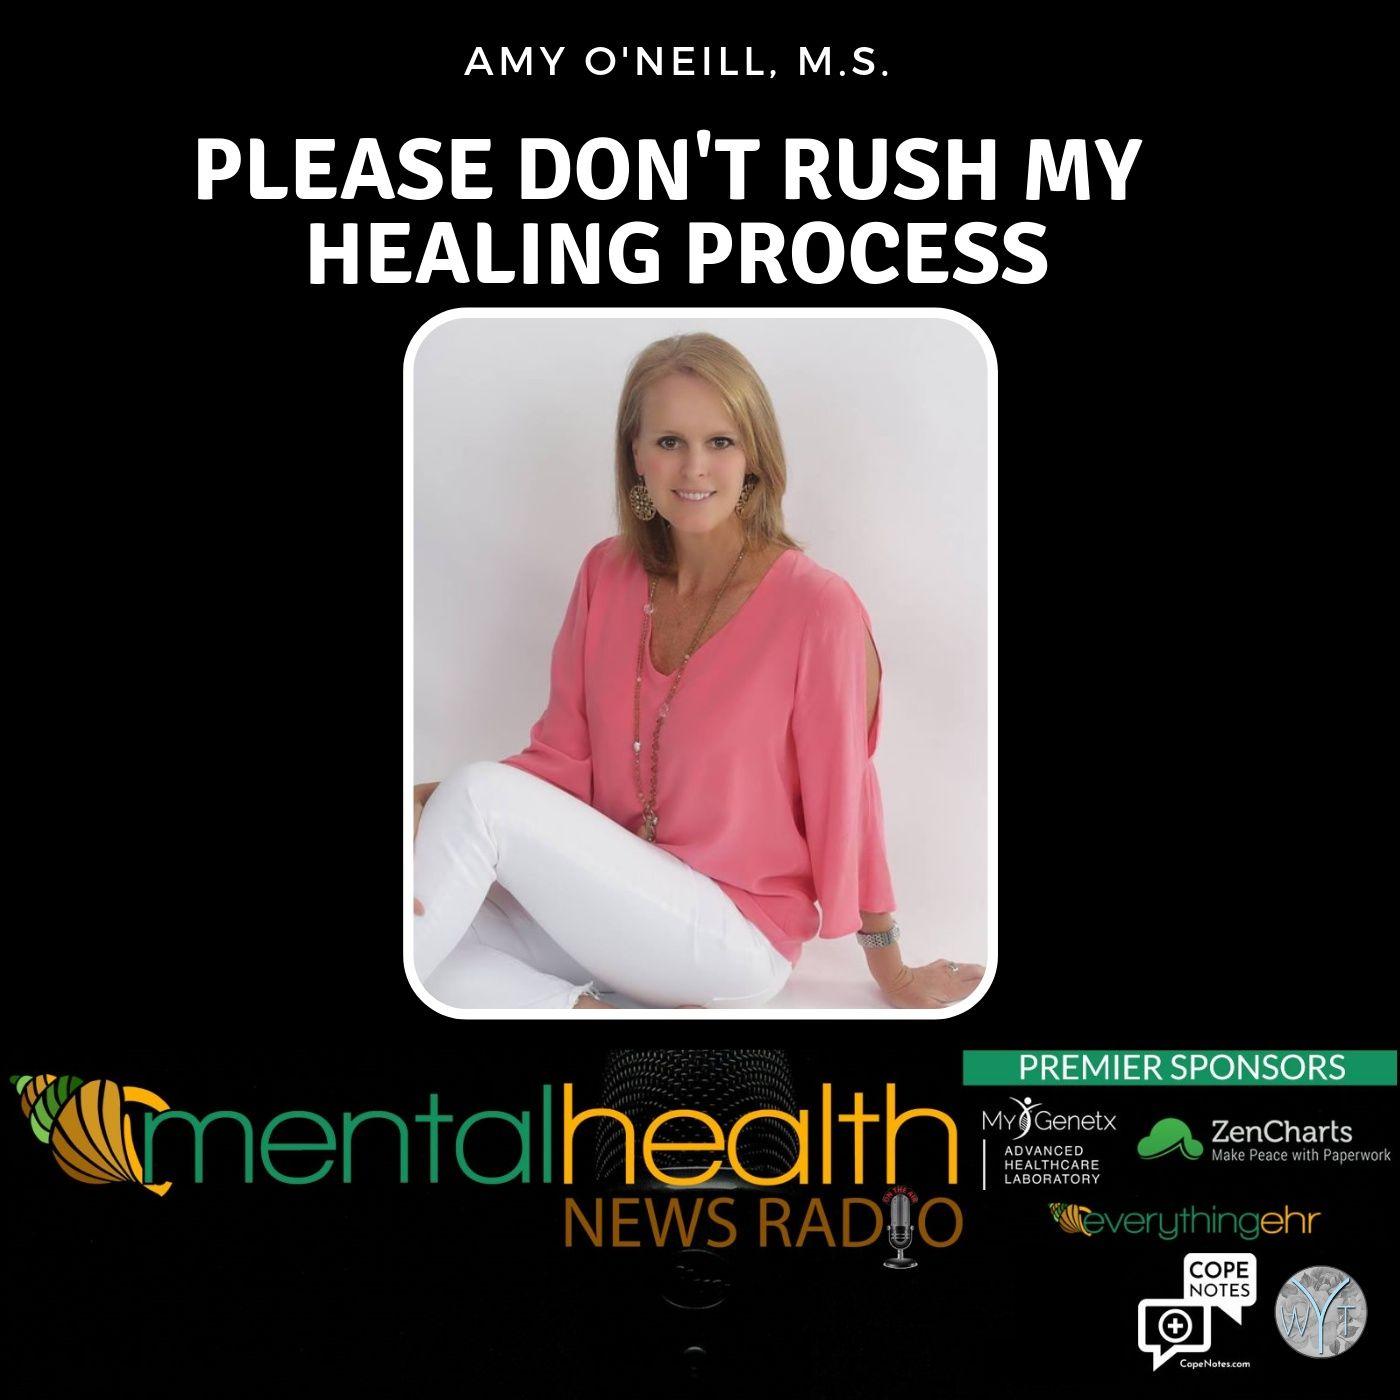 Mental Health News Radio - Please Don't Rush My Healing Process